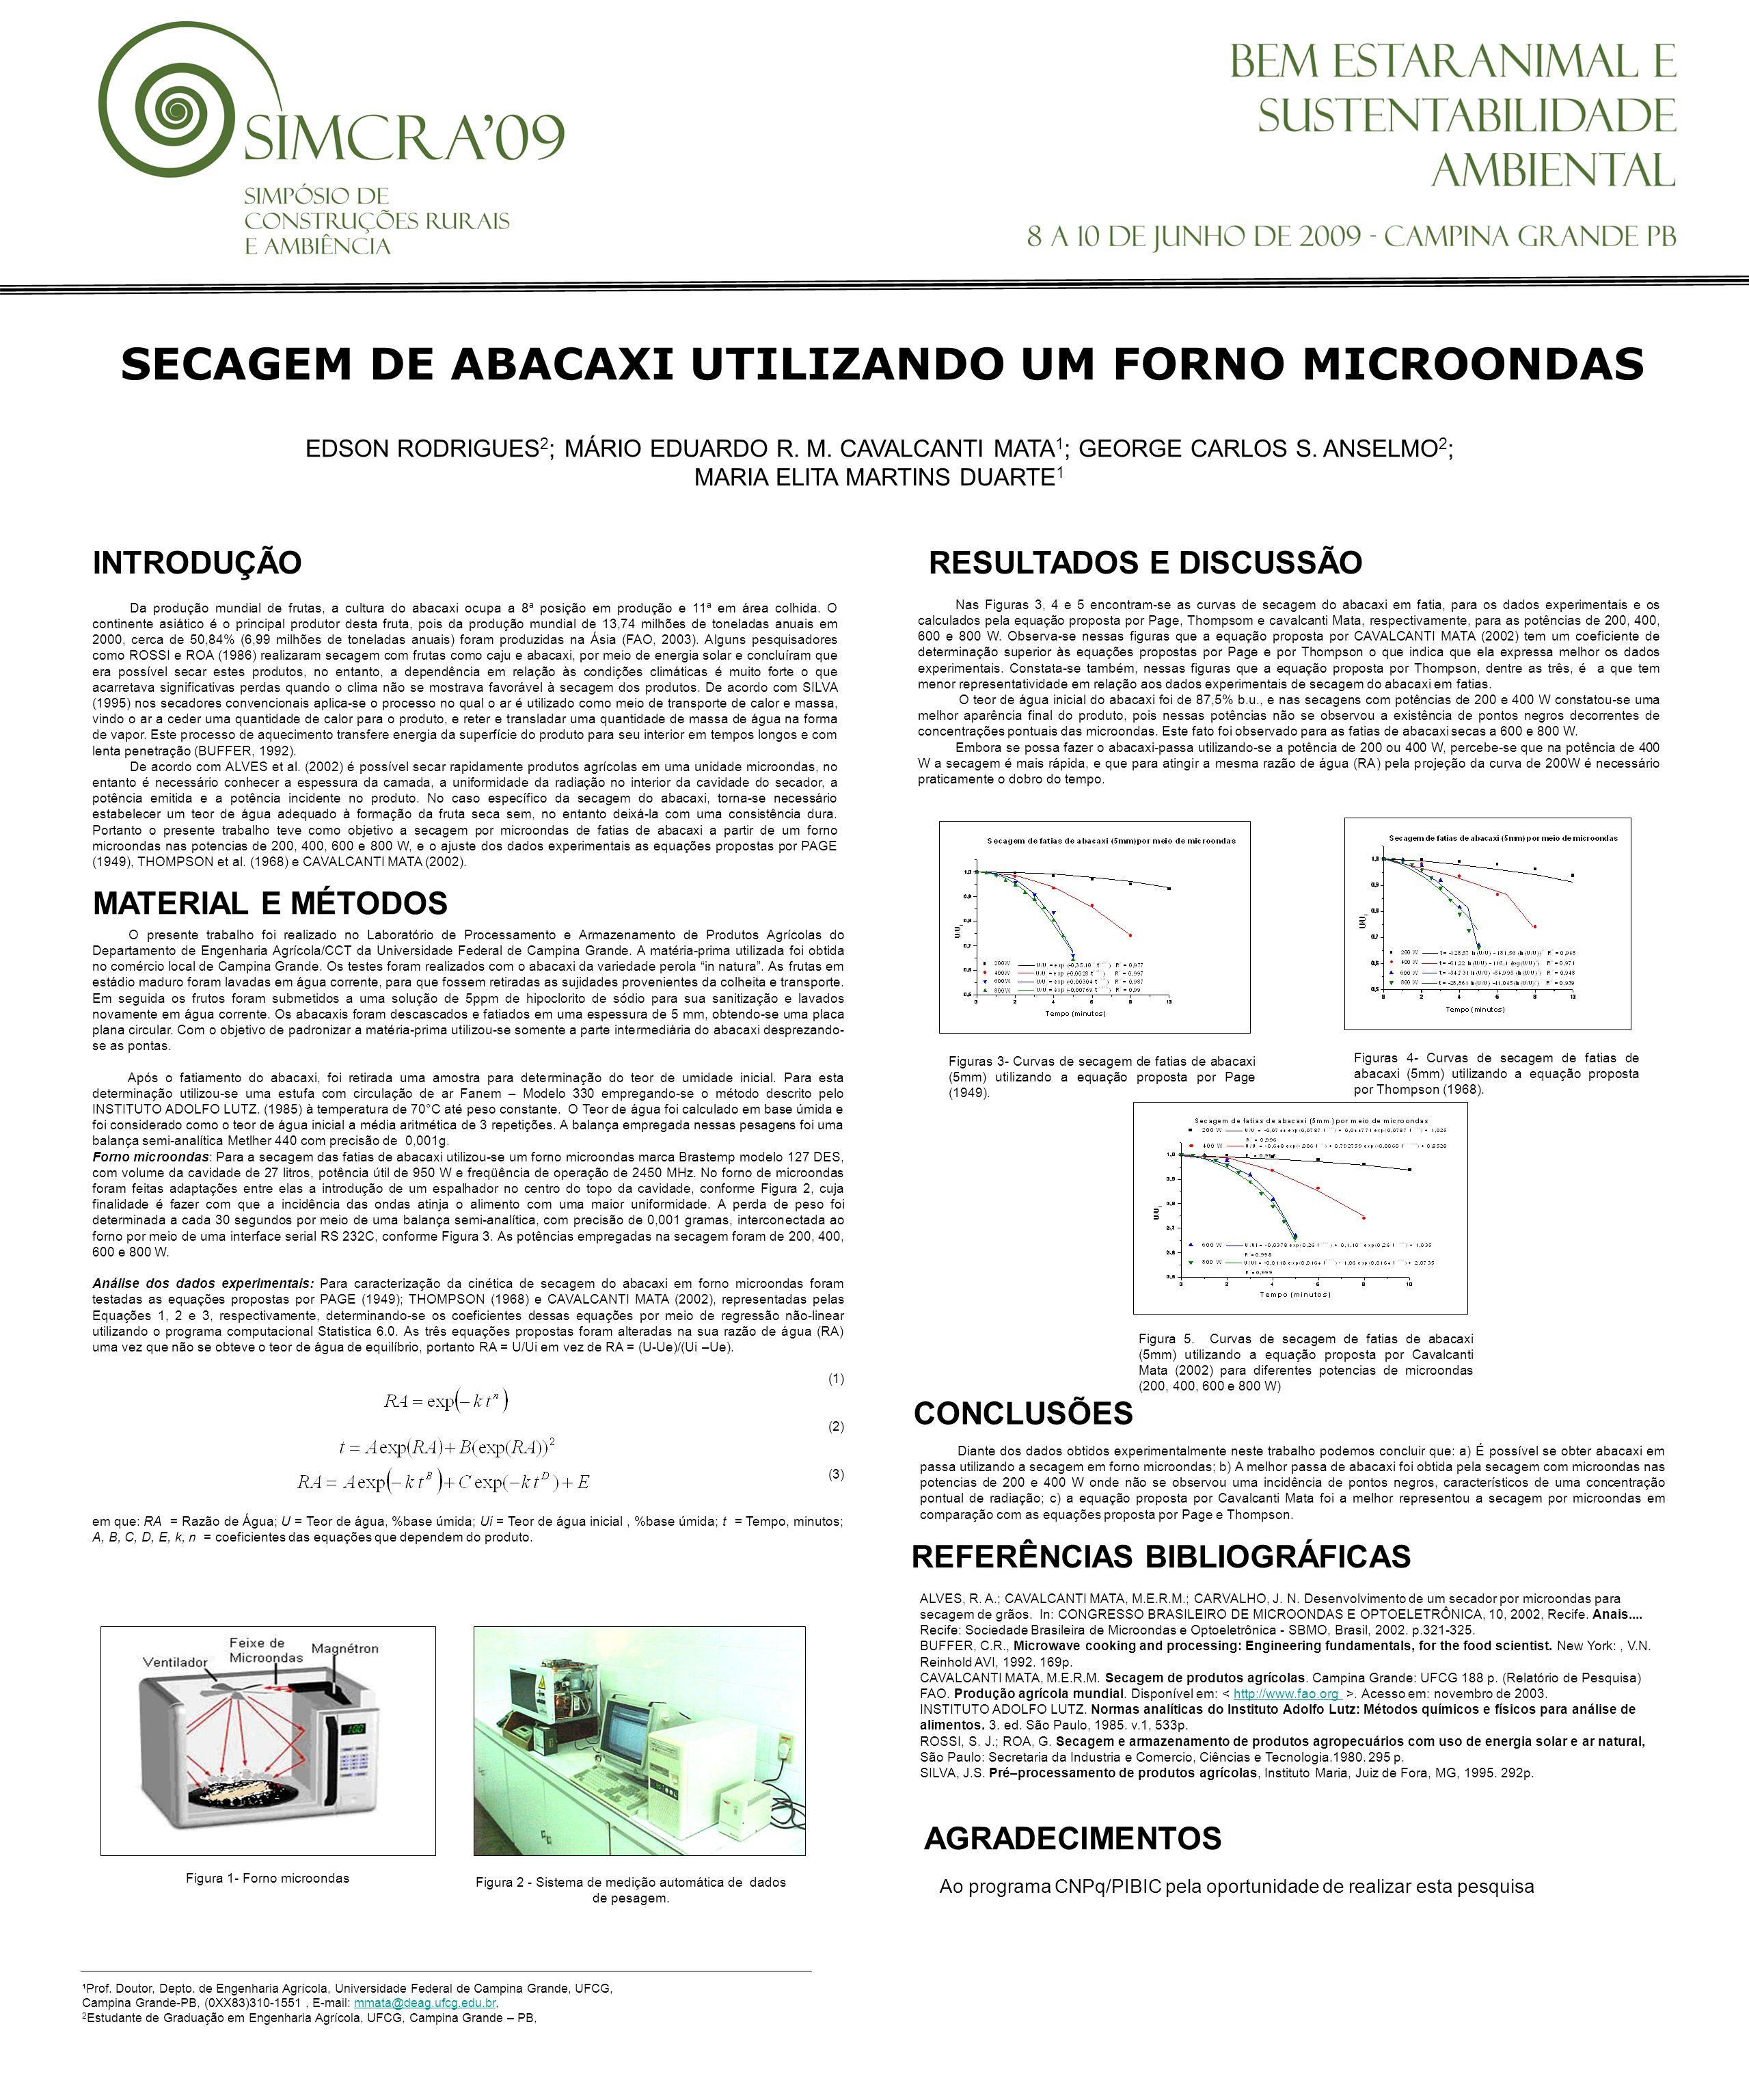 EDSON RODRIGUES 2 ; MÁRIO EDUARDO R.M. CAVALCANTI MATA 1 ; GEORGE CARLOS S.